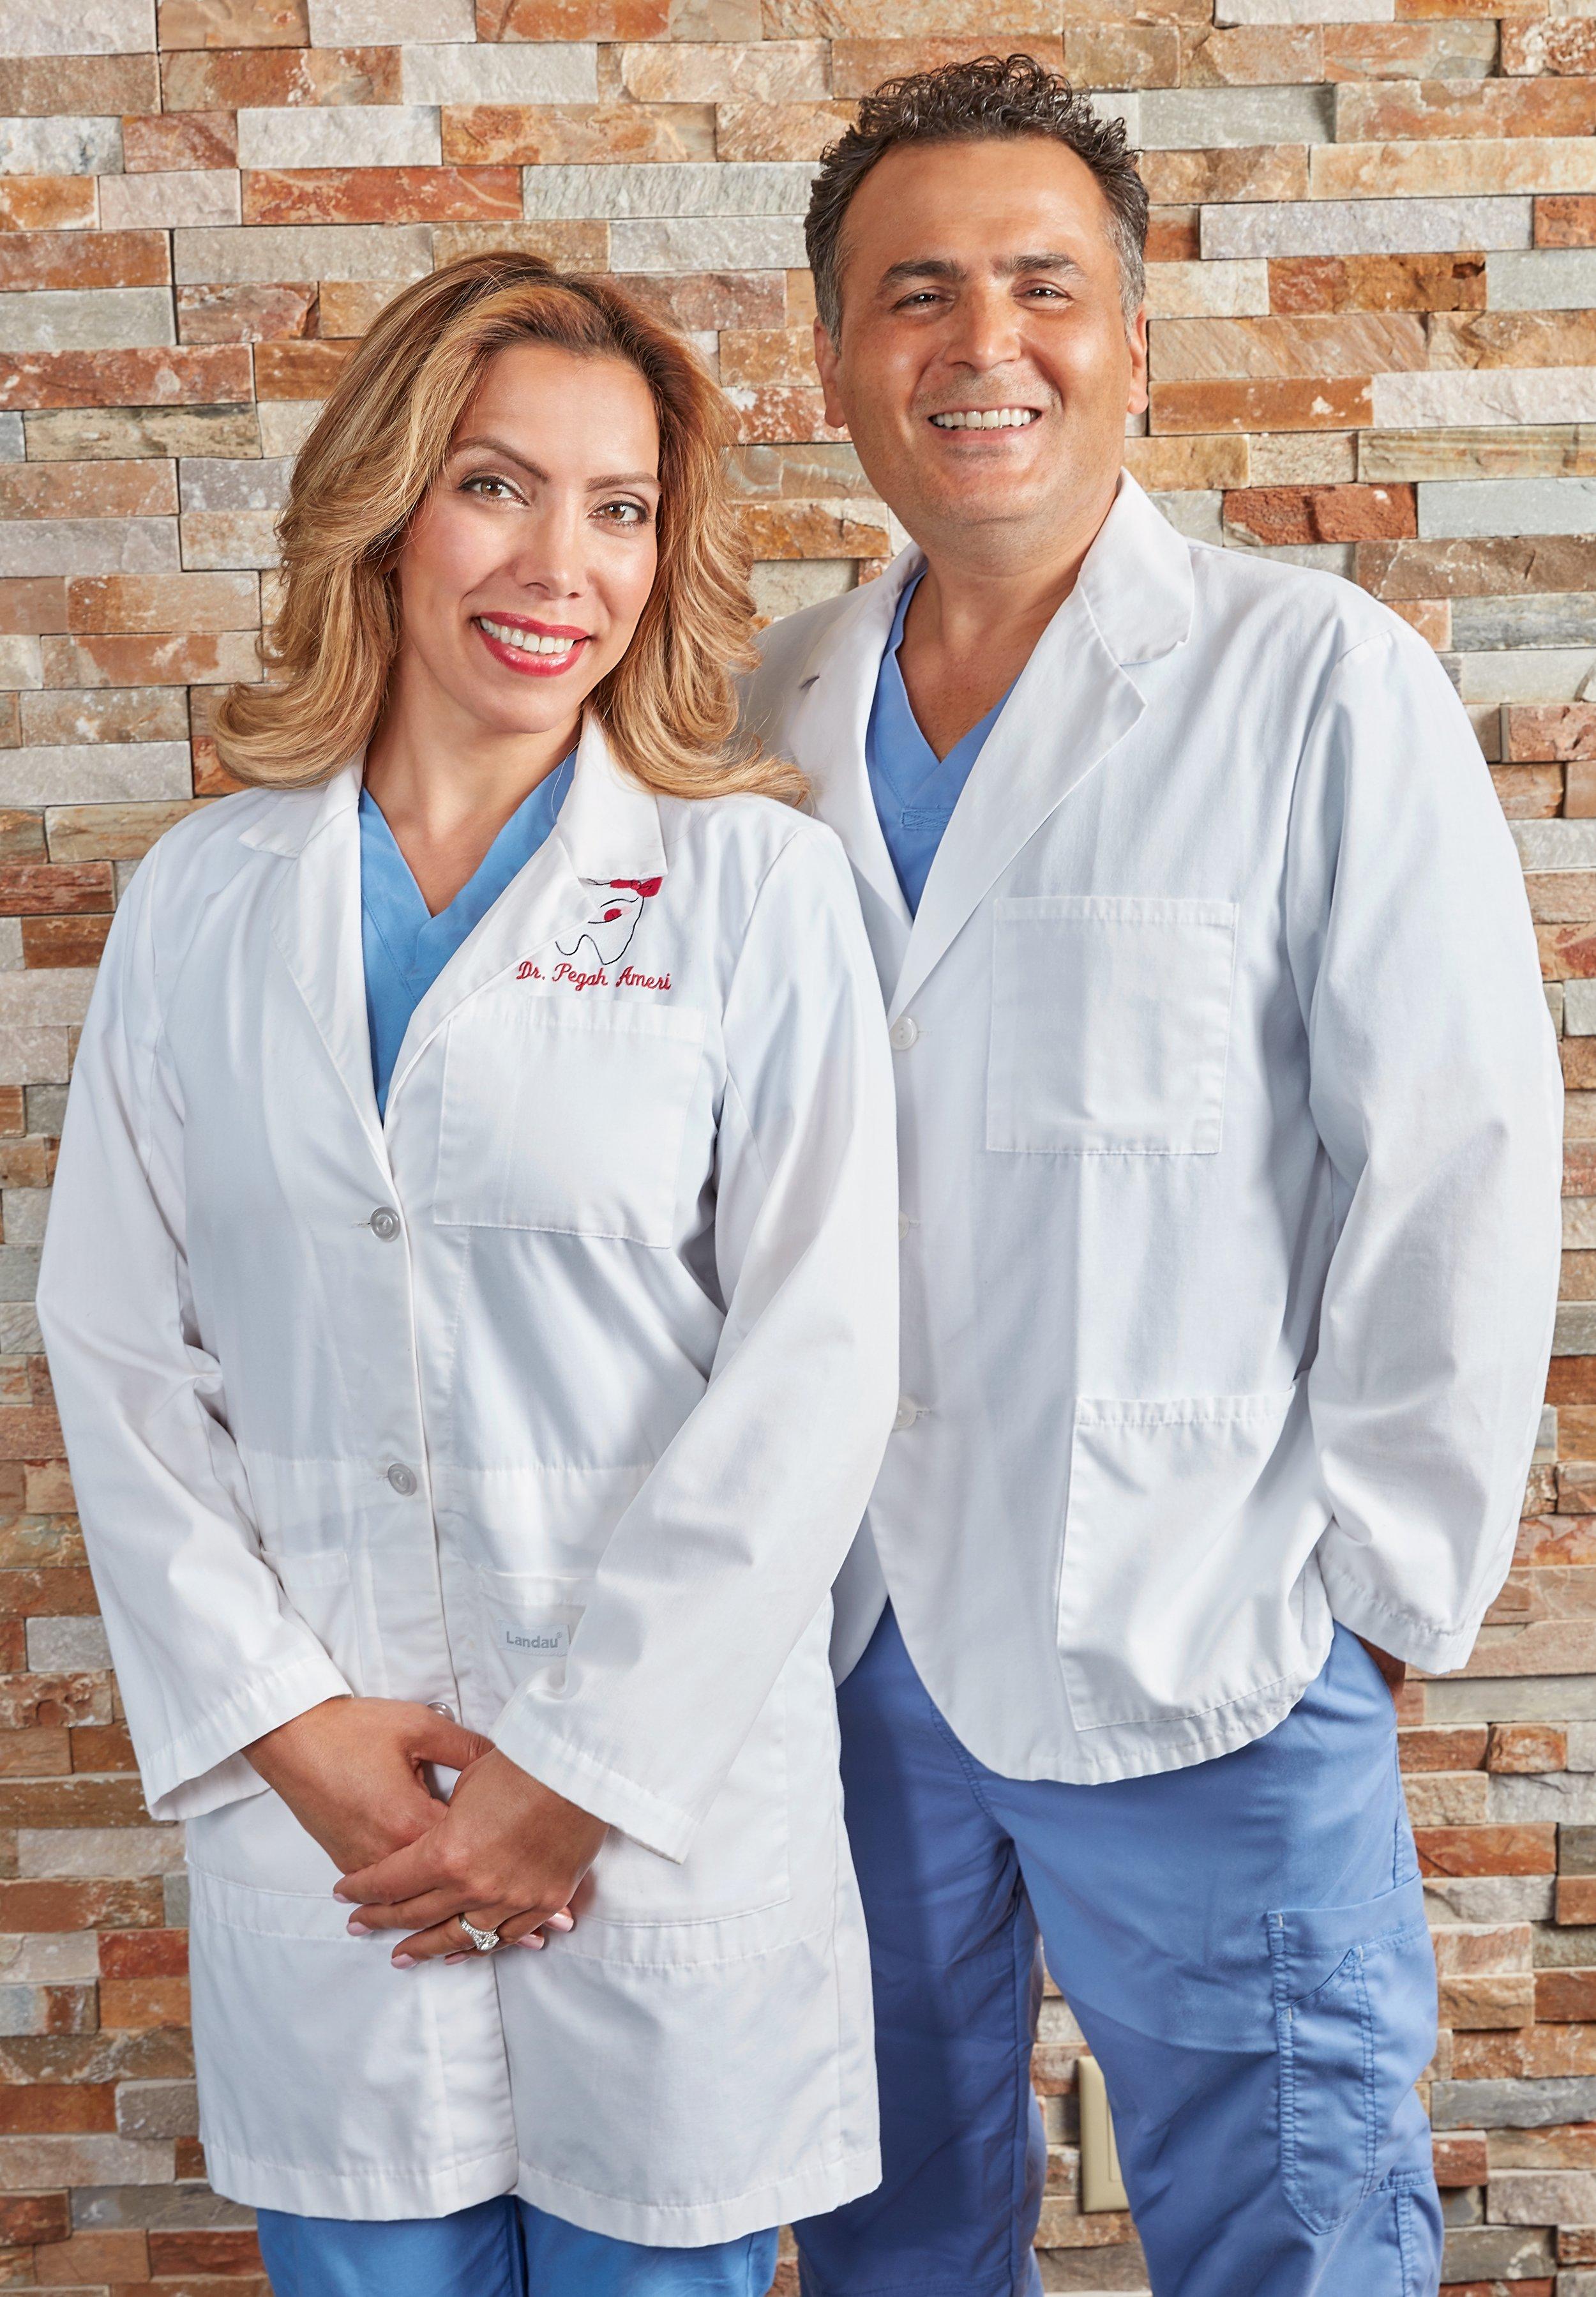 Dr. Shahram Lashgari & Dr. Pegah Ameri |Credit: Photography by Eric Garcia-March